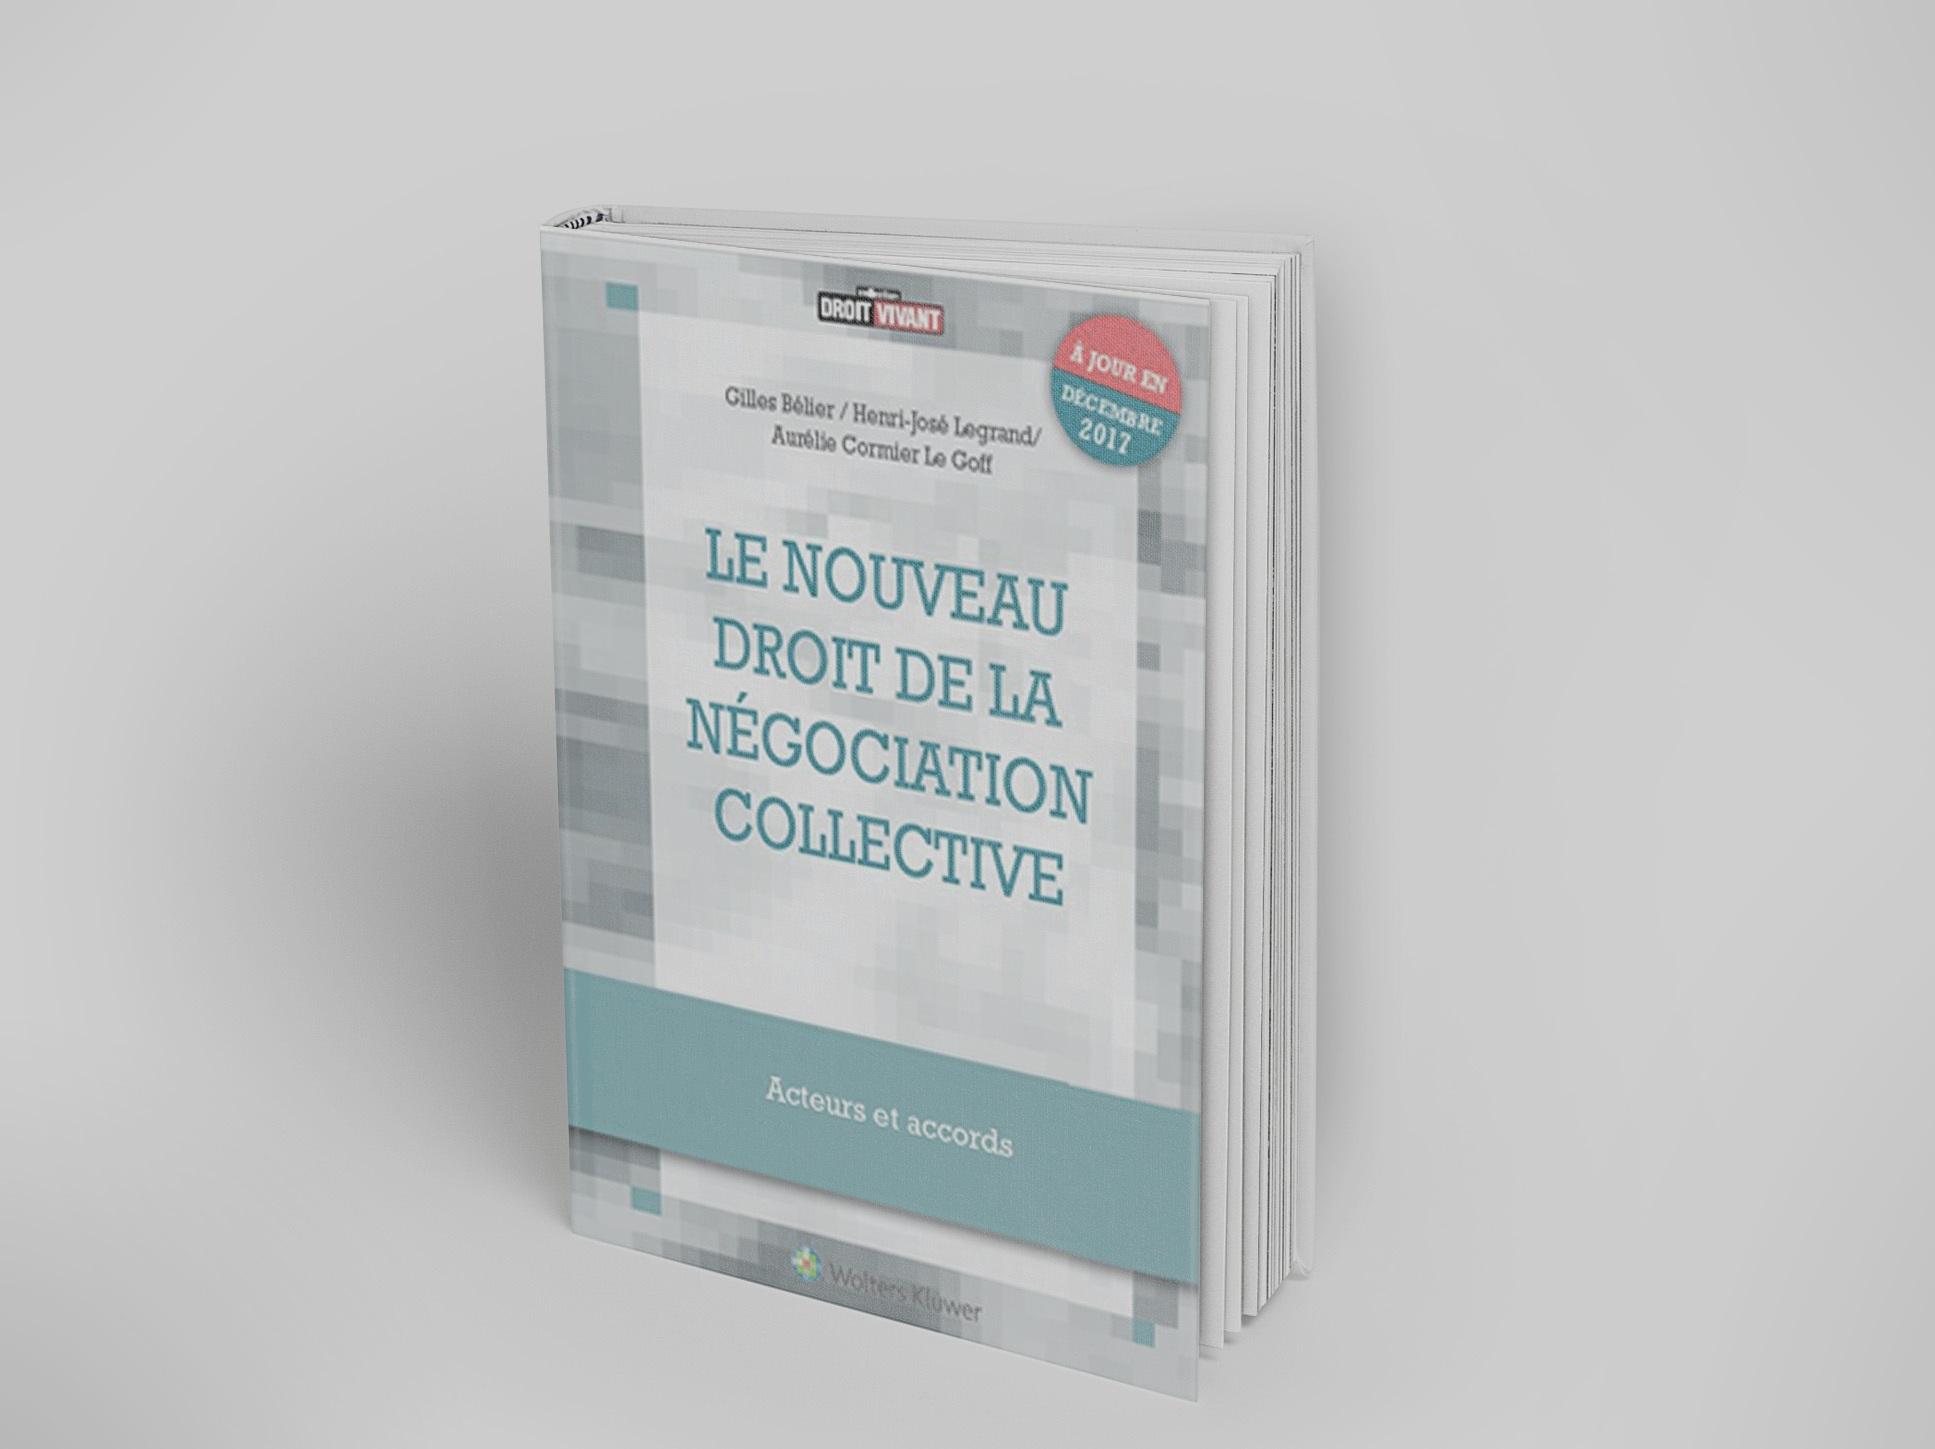 la-negociation-collective-en-entreprise-1138-large.jpg